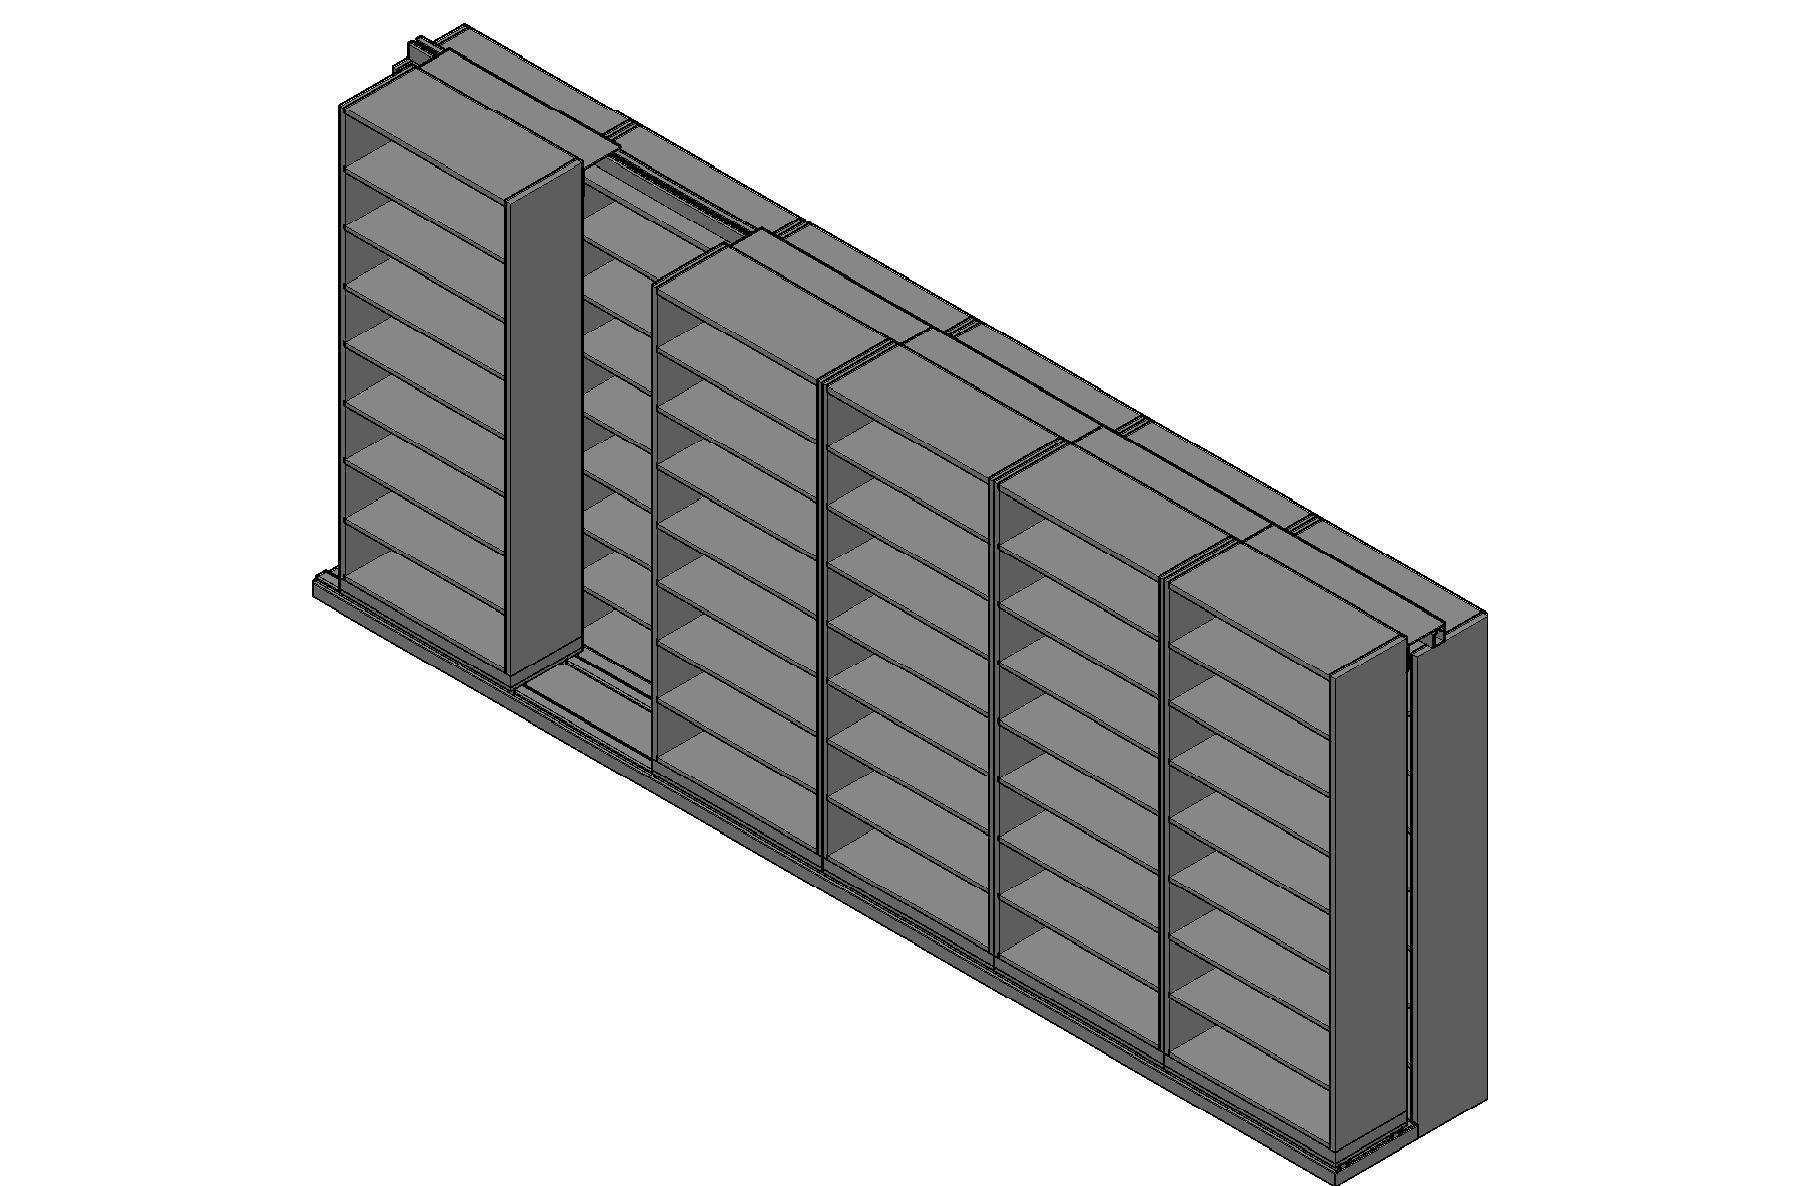 "Legal Size Sliding Shelves - 2 Rows Deep - 8 Levels - (36"" x 15"" Shelves) - 220"" Total Width"